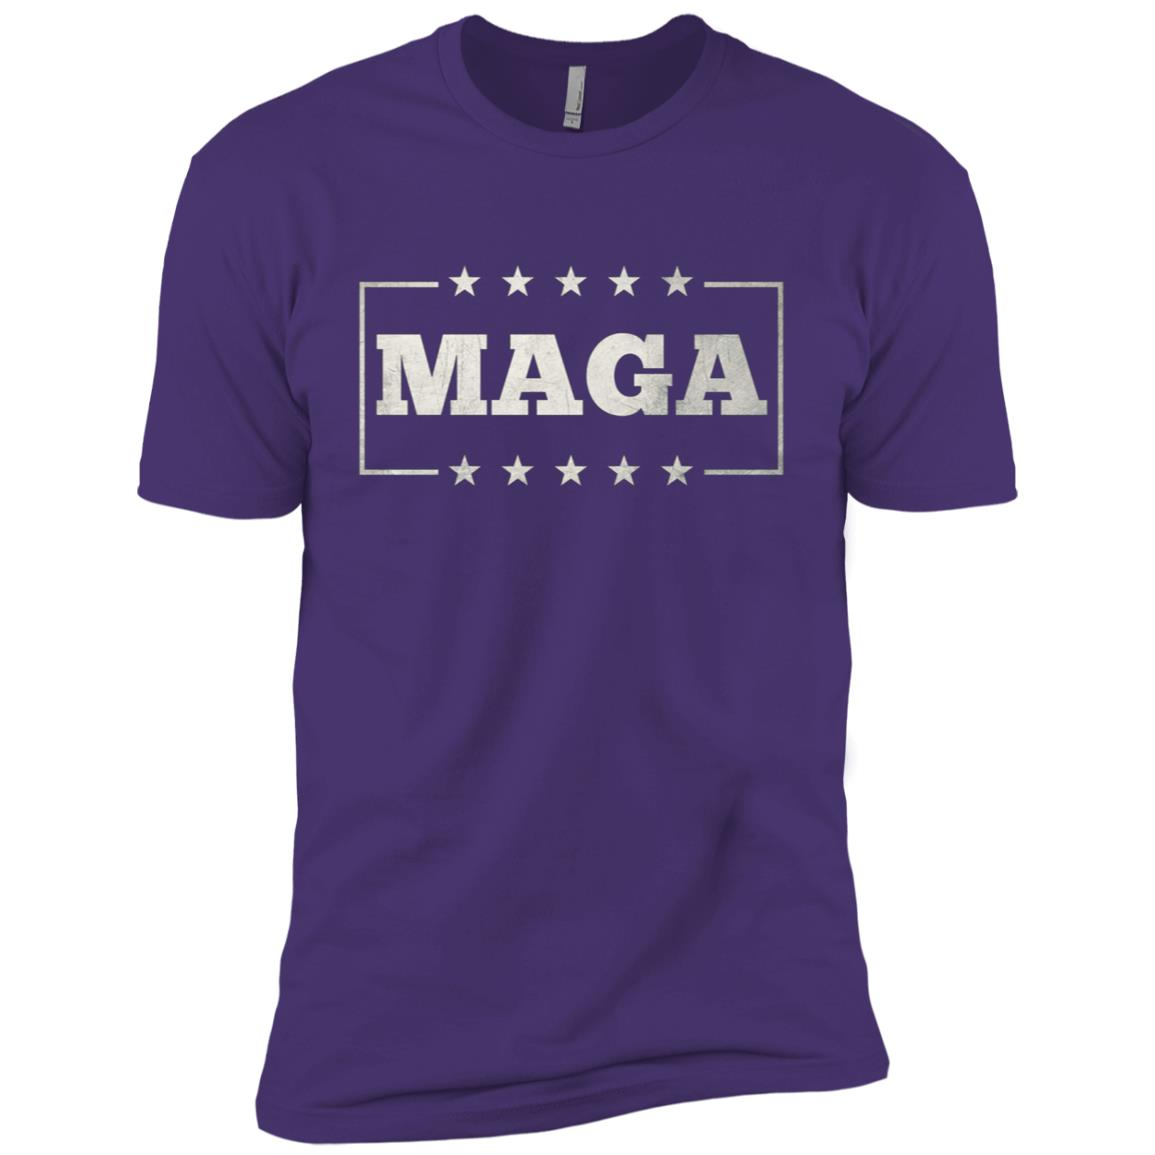 MAGA America Is Great Pro Trump In Metal Men Short Sleeve T-Shirt